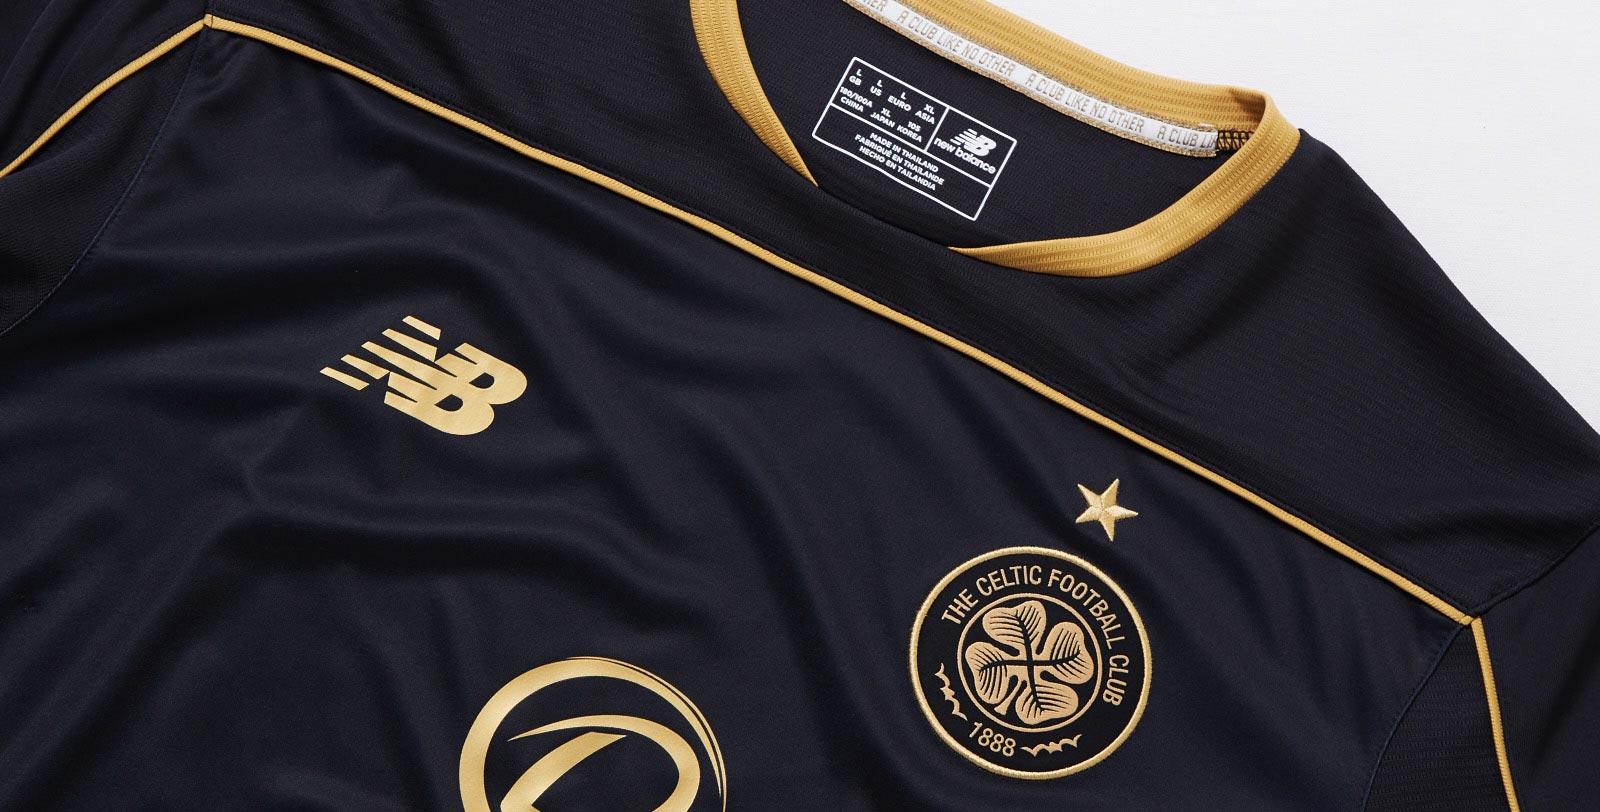 Celtic 2016-17 Away Kit Revealed 5e6ceac0f